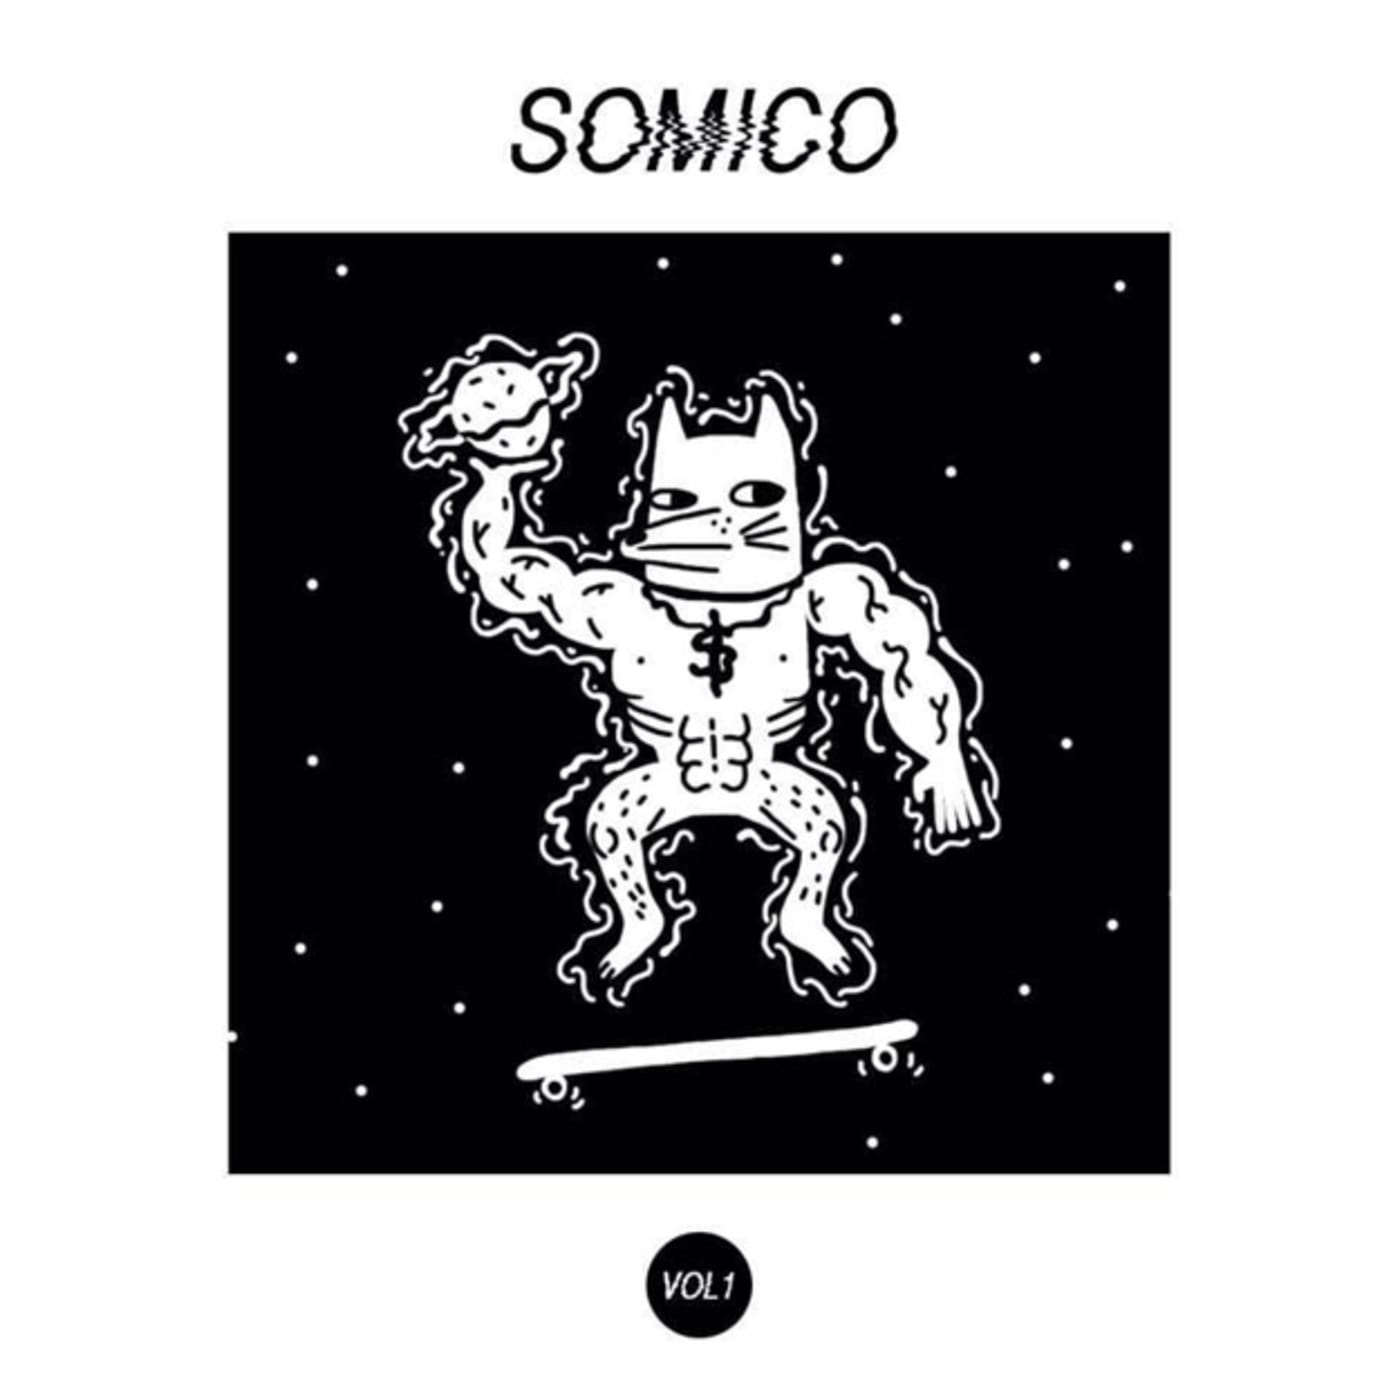 somico vol 1